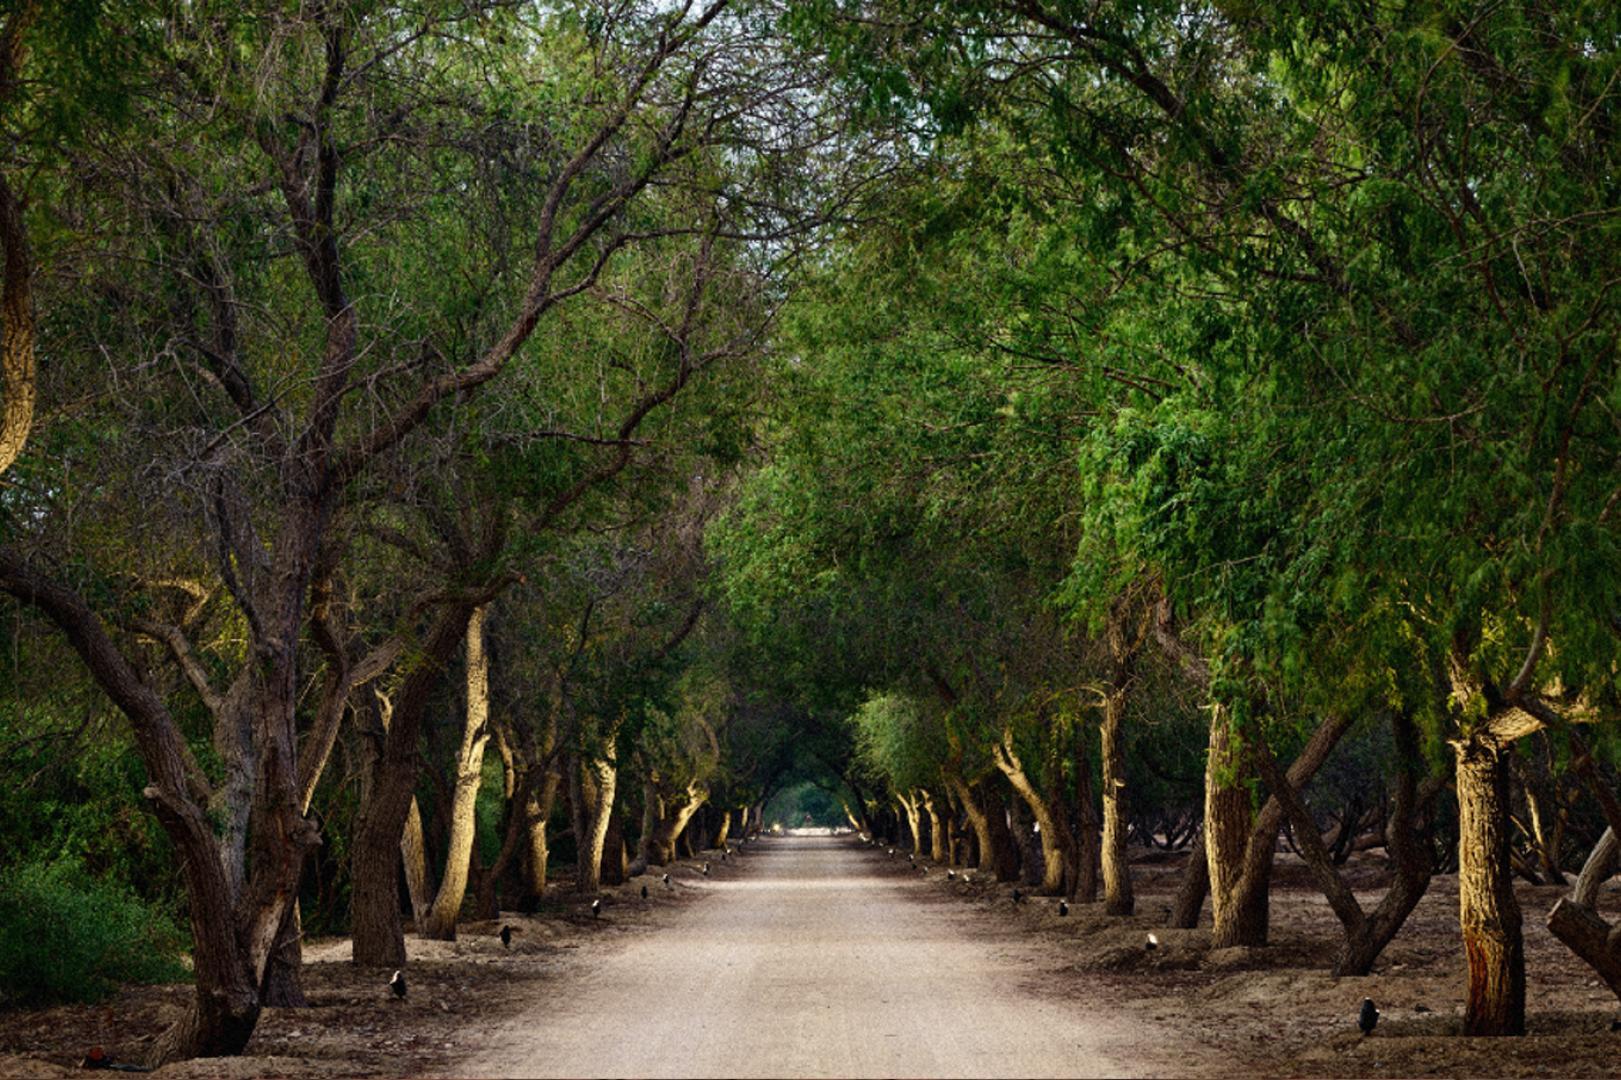 al-jurf-garden-abu-dhabi-nature-tress